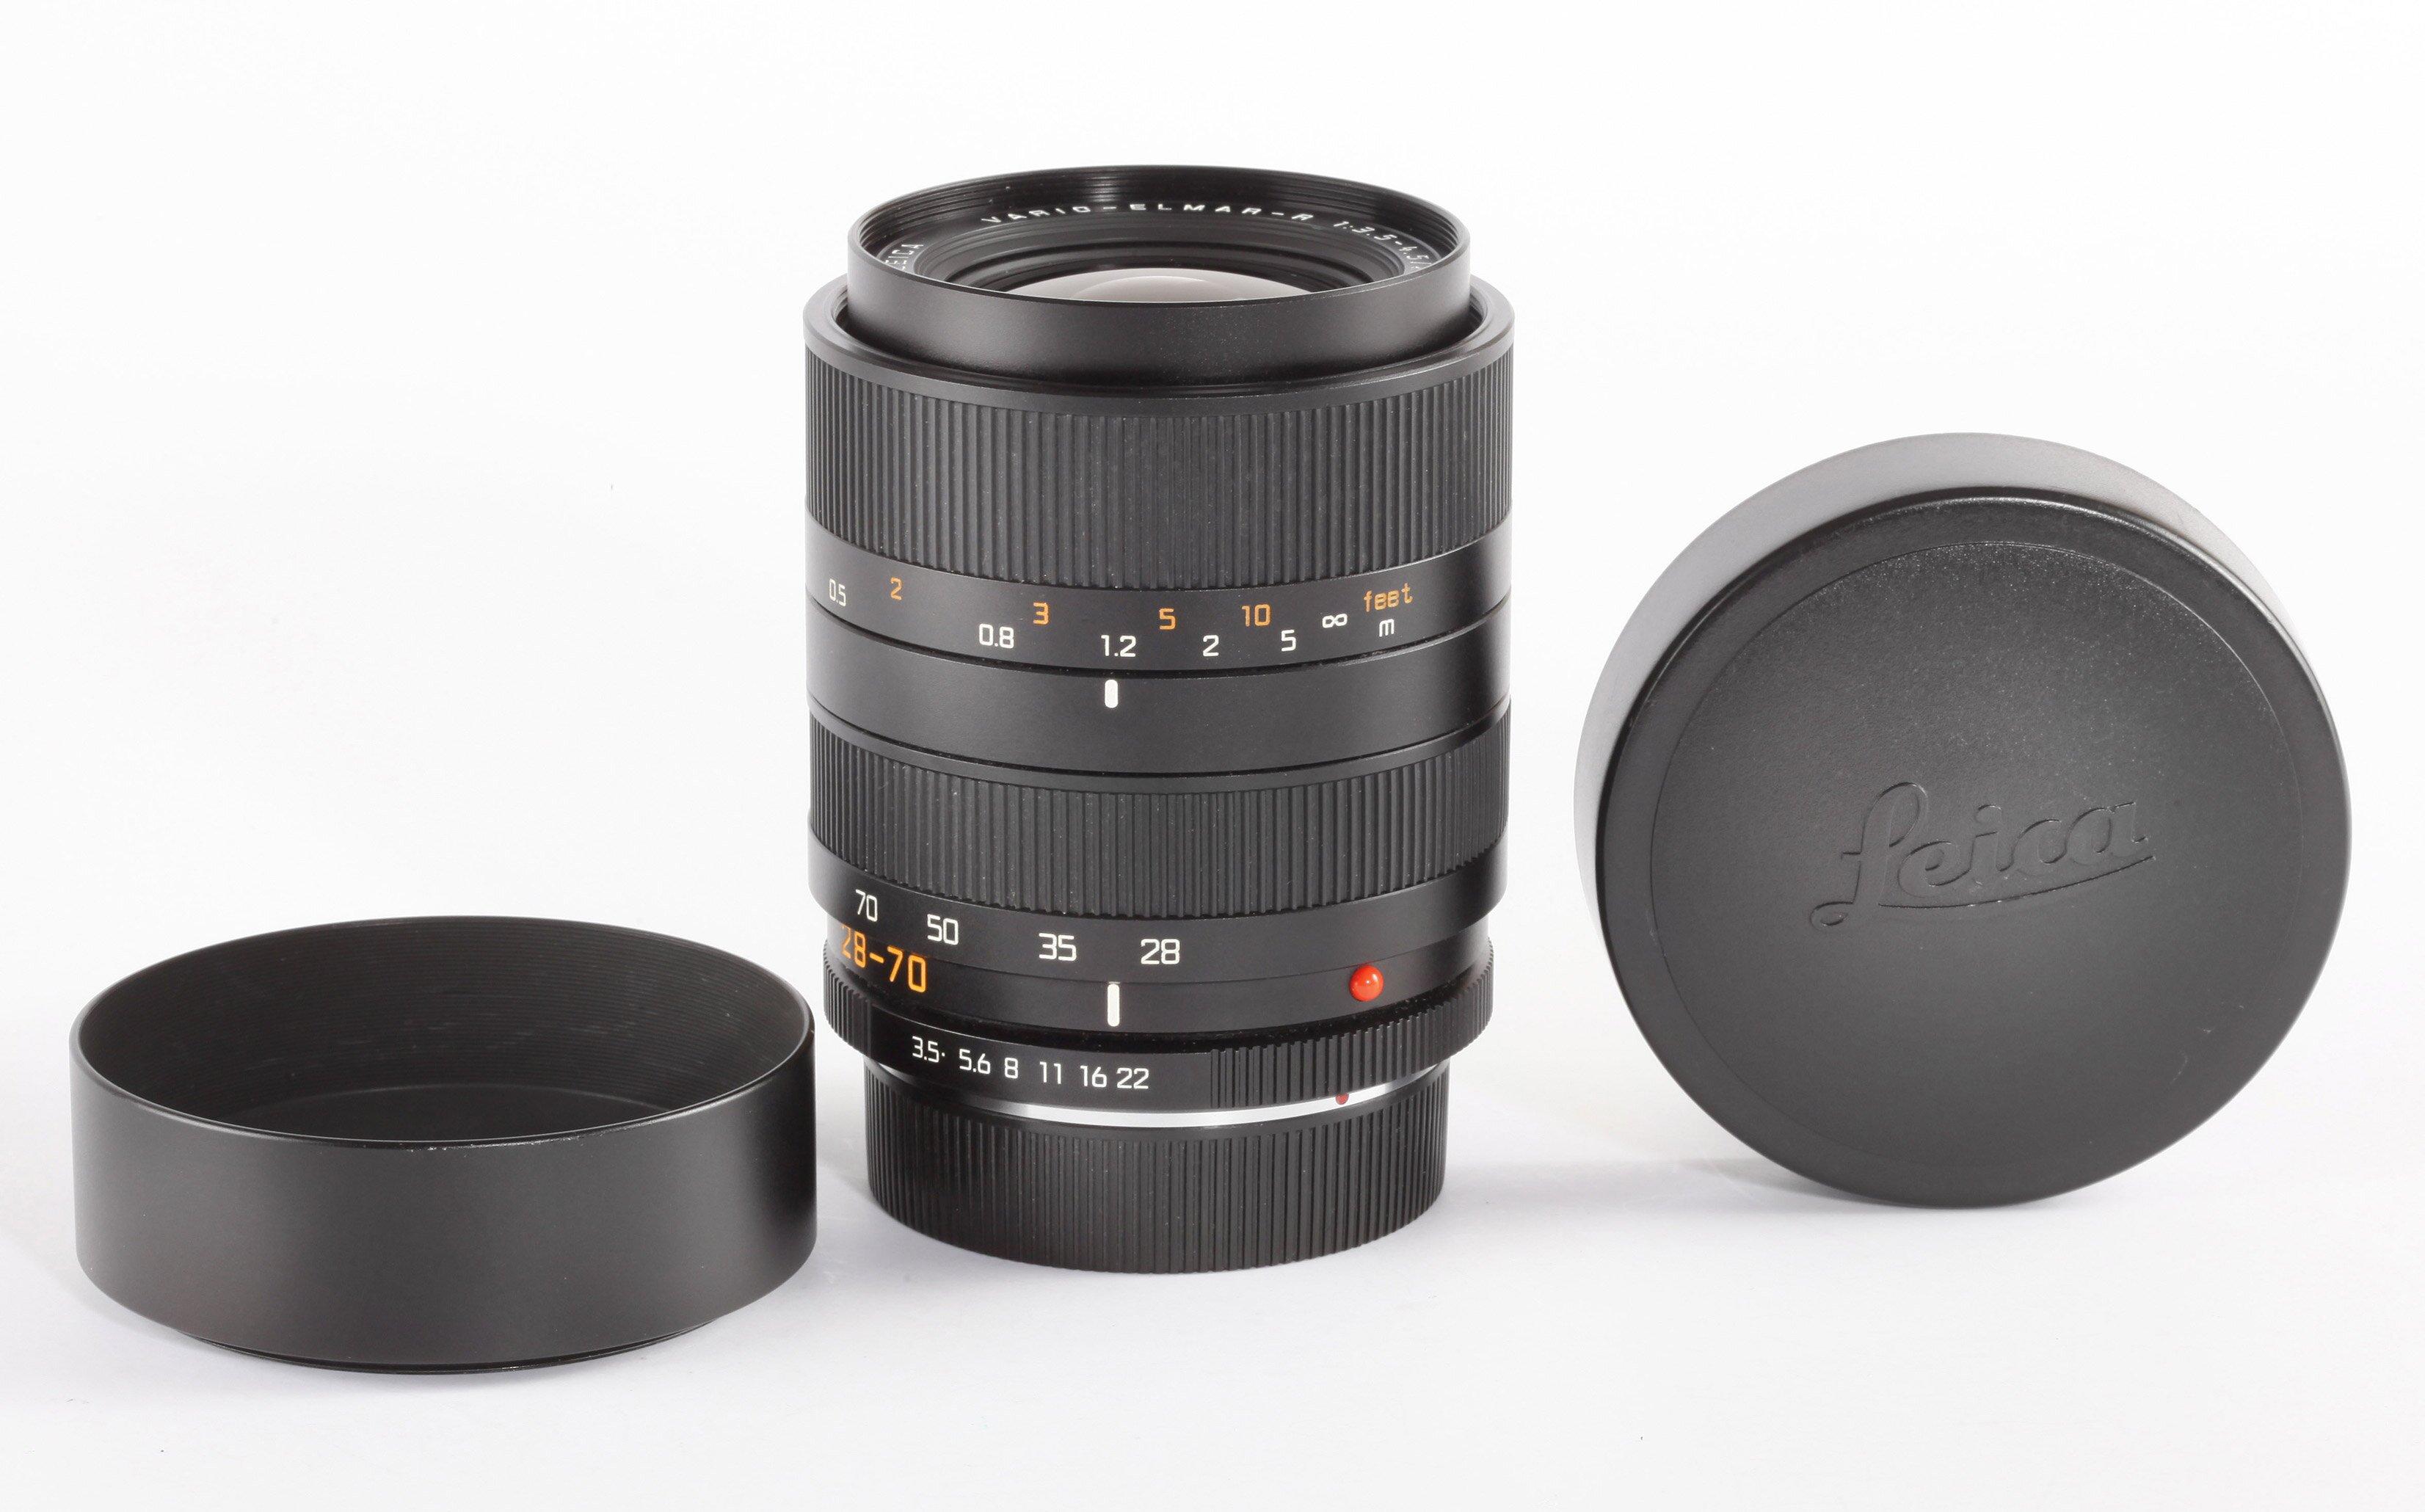 Leica Vario-Elmarit-R 3,5-4,5/28-70mm ROM